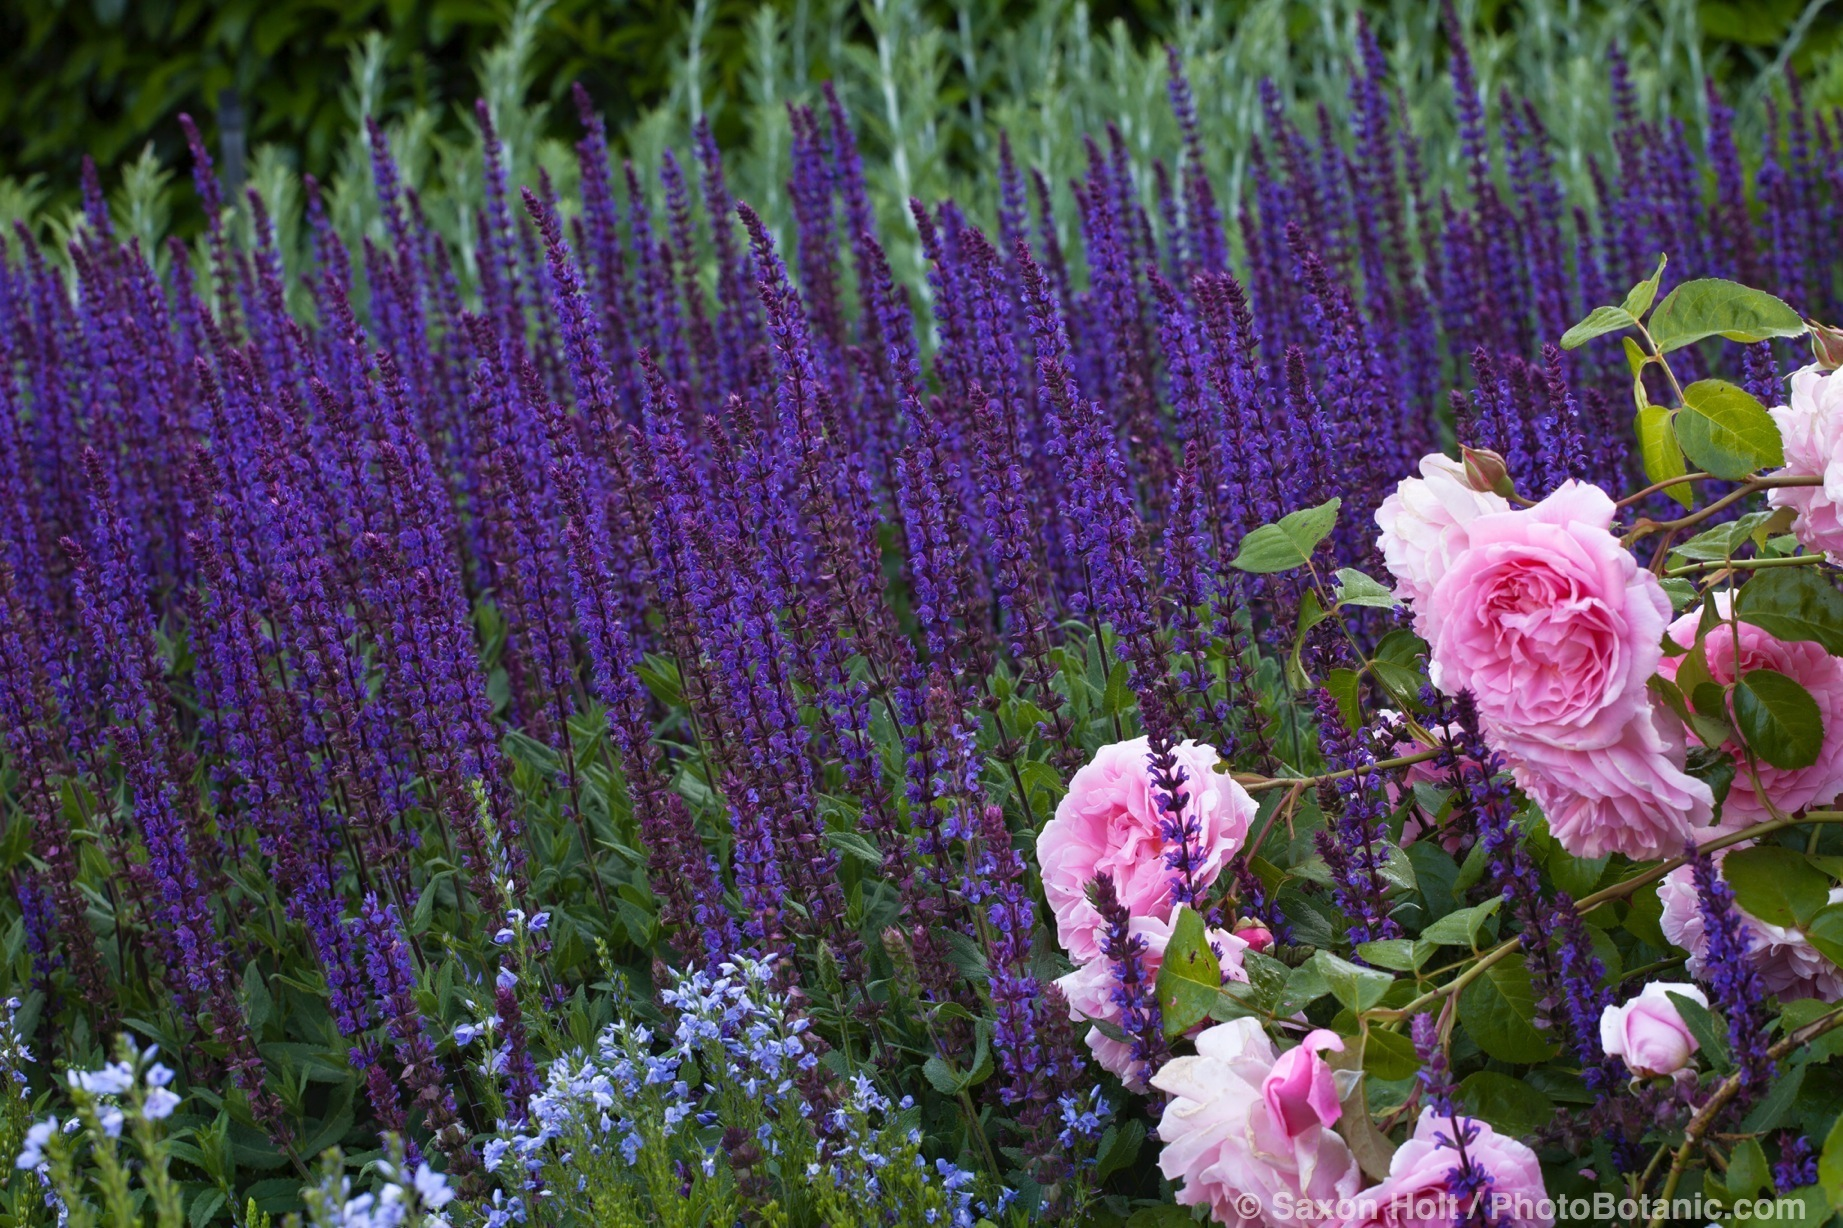 Salvia nemorosa 'Caradonna', Garden sage aka Meadow Sage or Balkan Clary, with Rosa 'Strawberry Hill' English Rose in mixed border